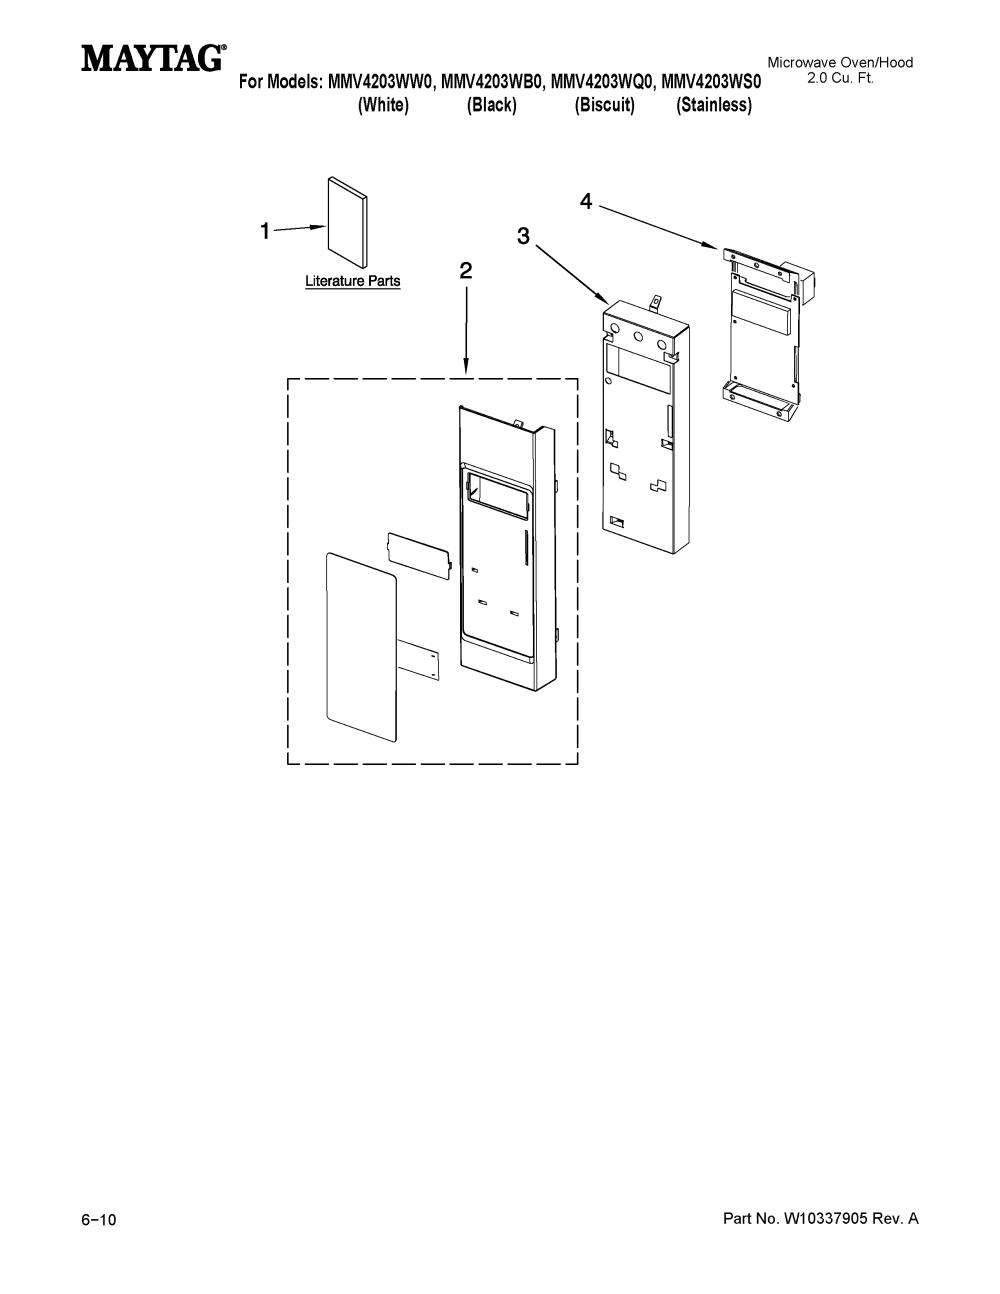 medium resolution of looking for maytag model mmv4203ws0 microwave hood combo repairmaytag mmv4203ws0 control panel parts diagram